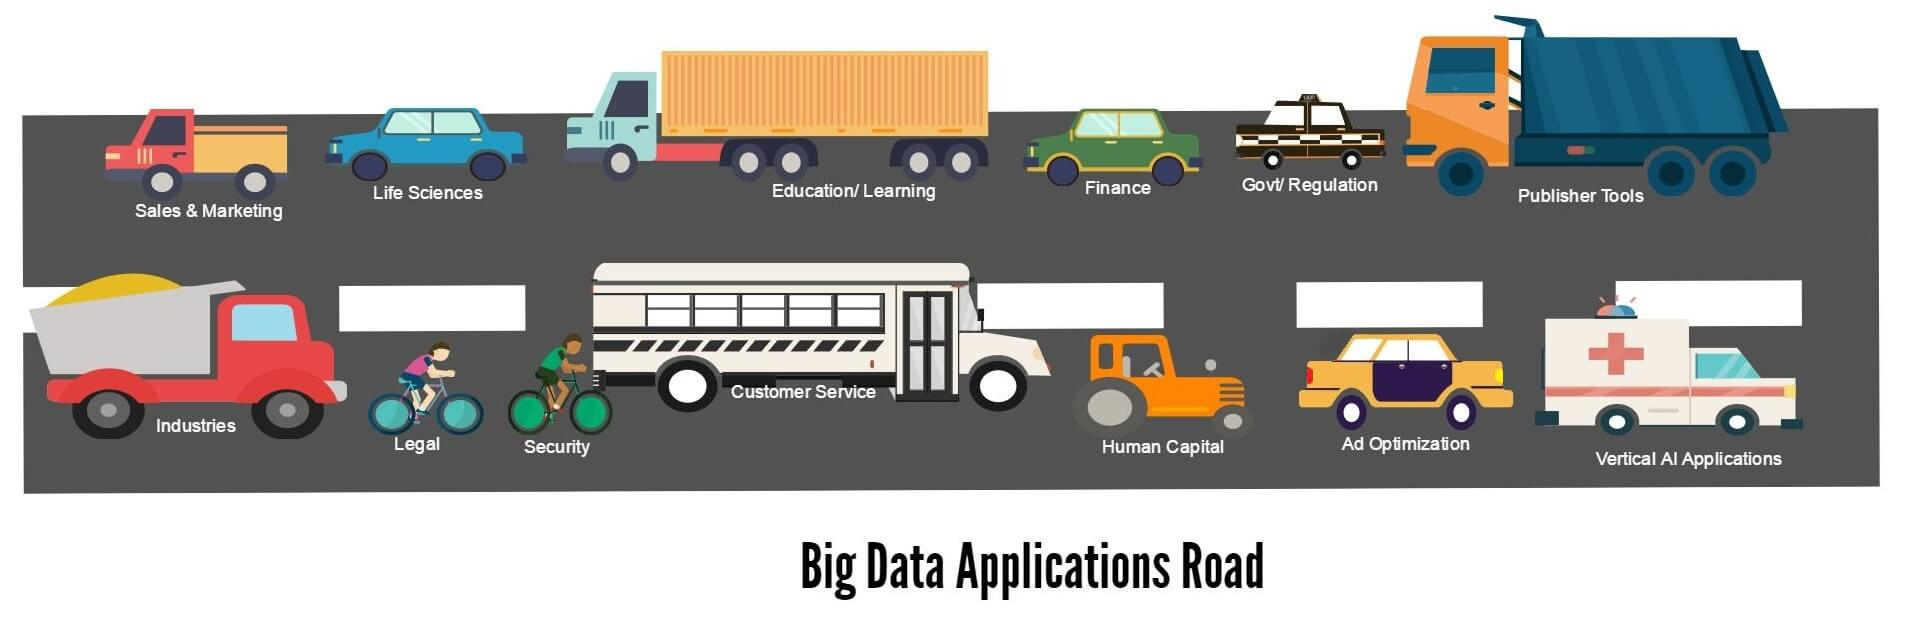 The Cross-Road of Big Data Applications 2016: